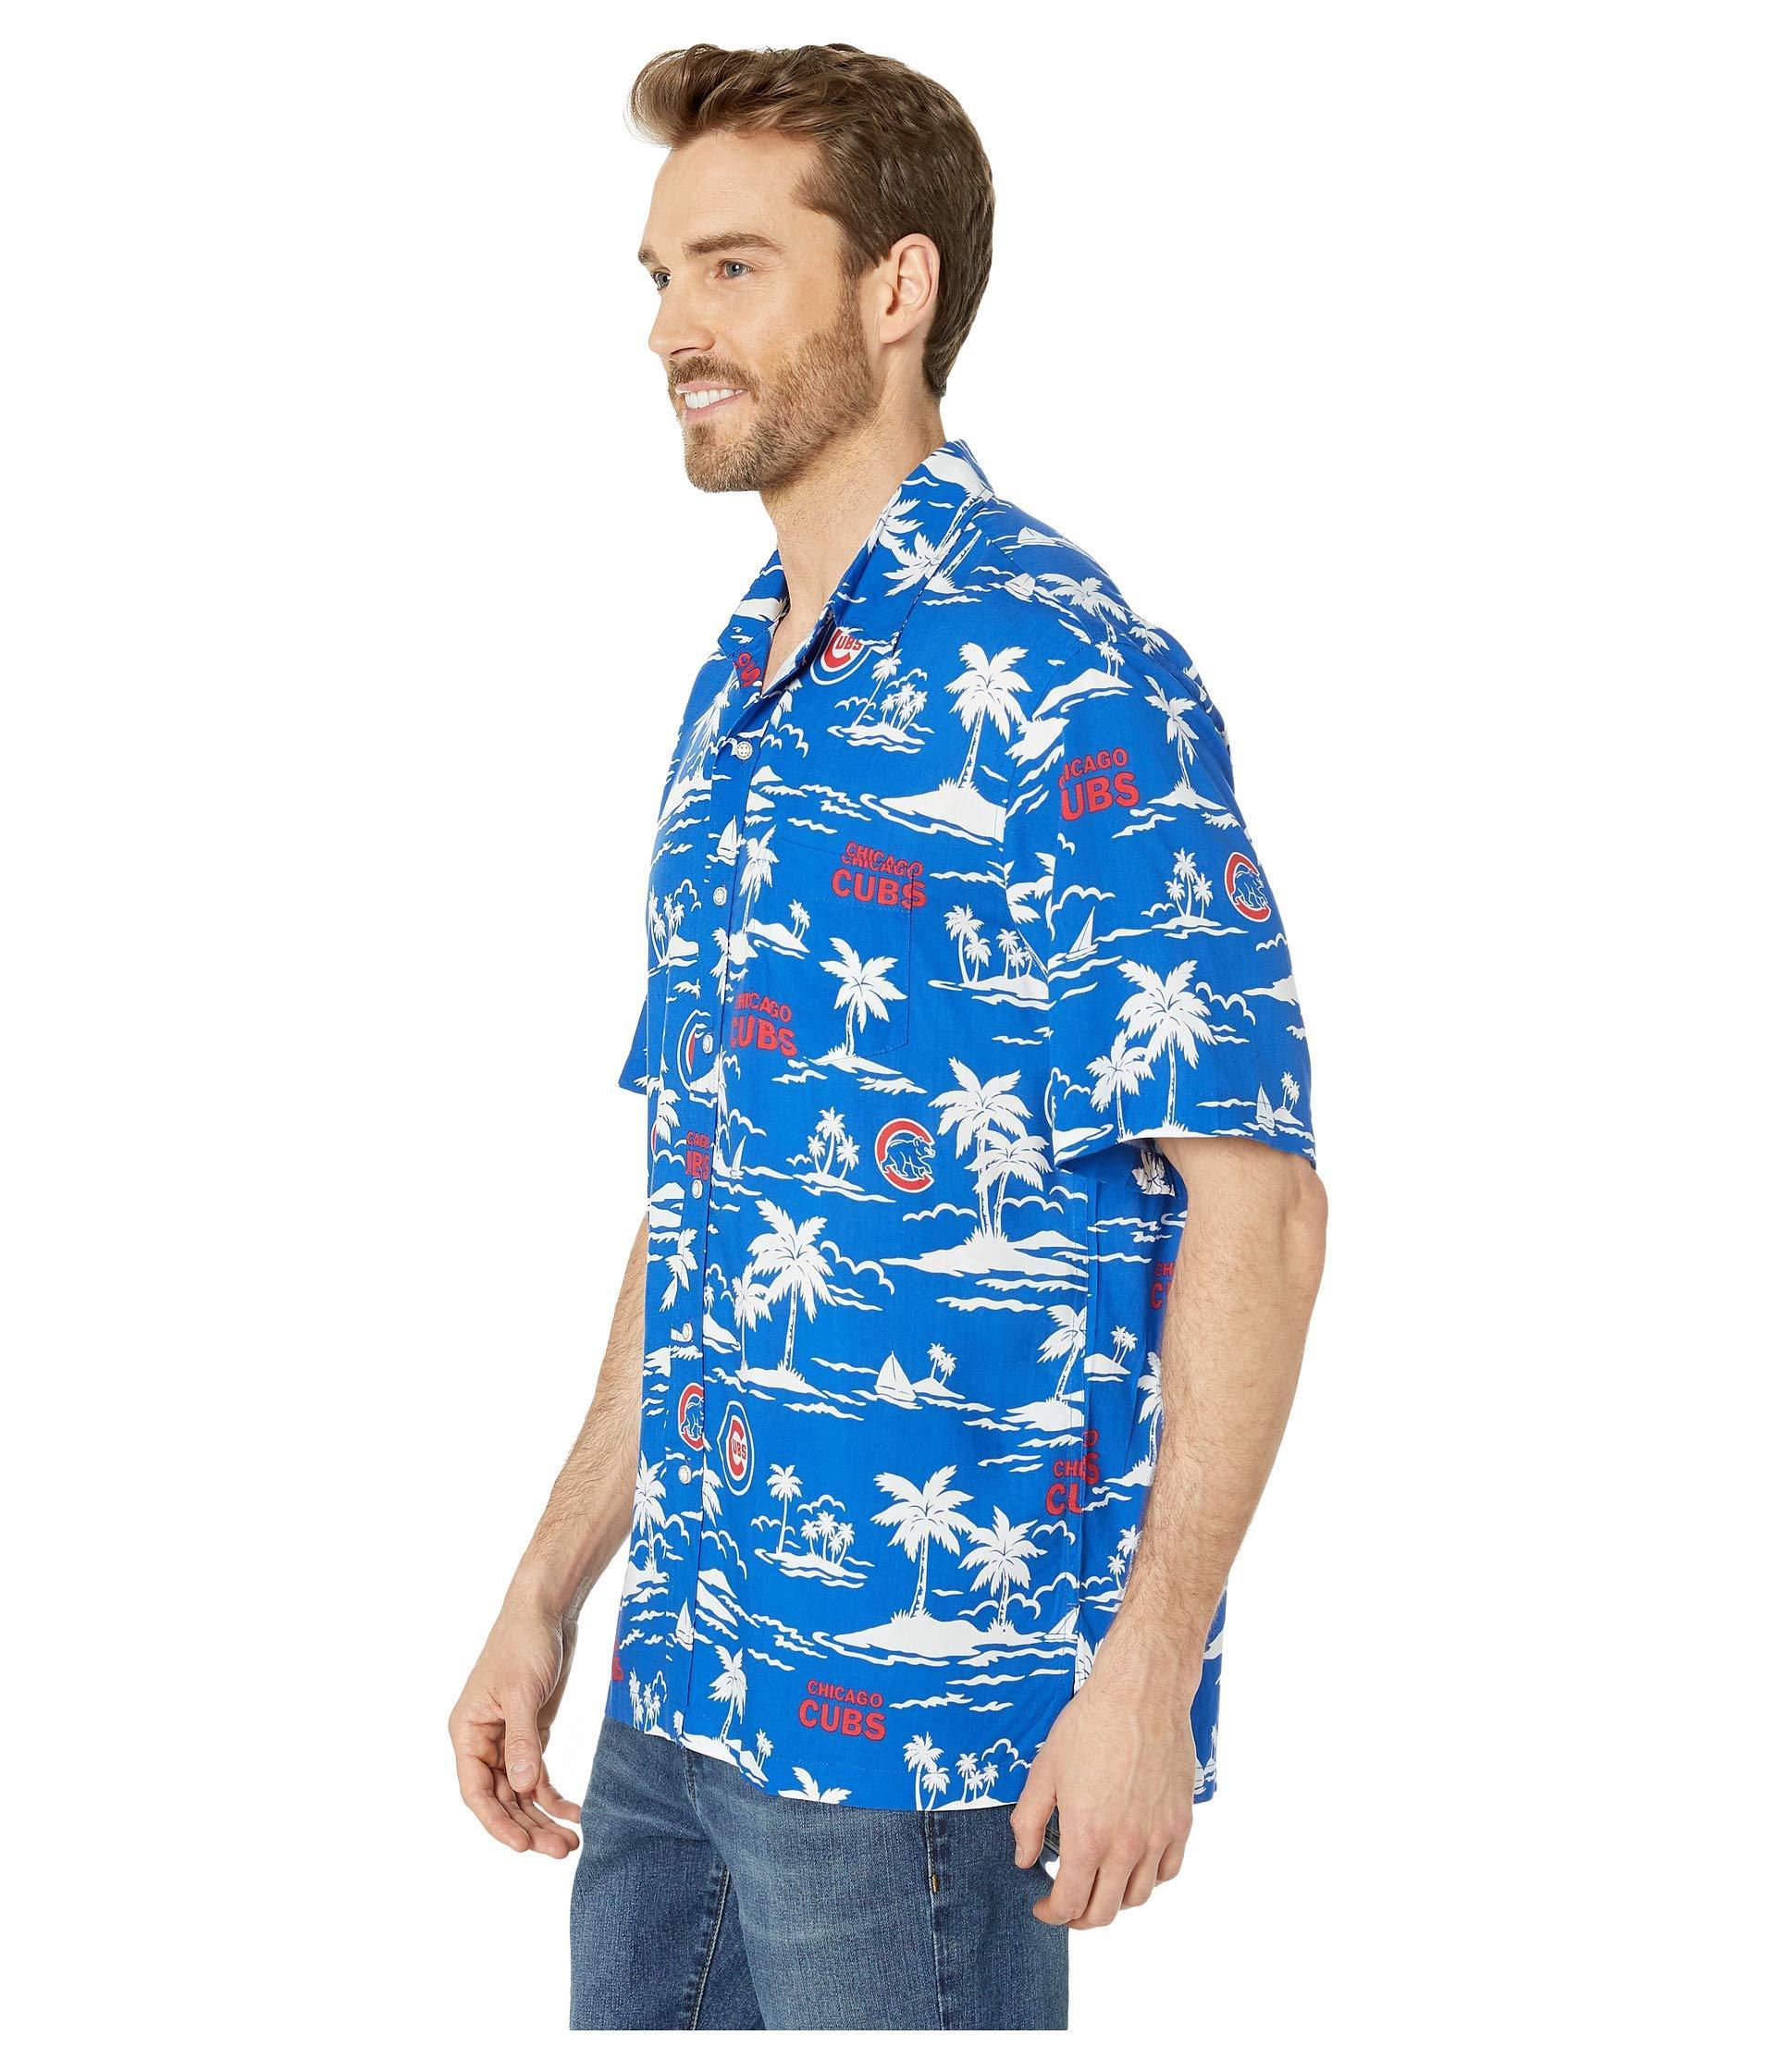 1a2e9089c Reyn Spooner - Chicago Cubs Vintage Rayon Shirt (blue) Men's Clothing for  Men -. View fullscreen